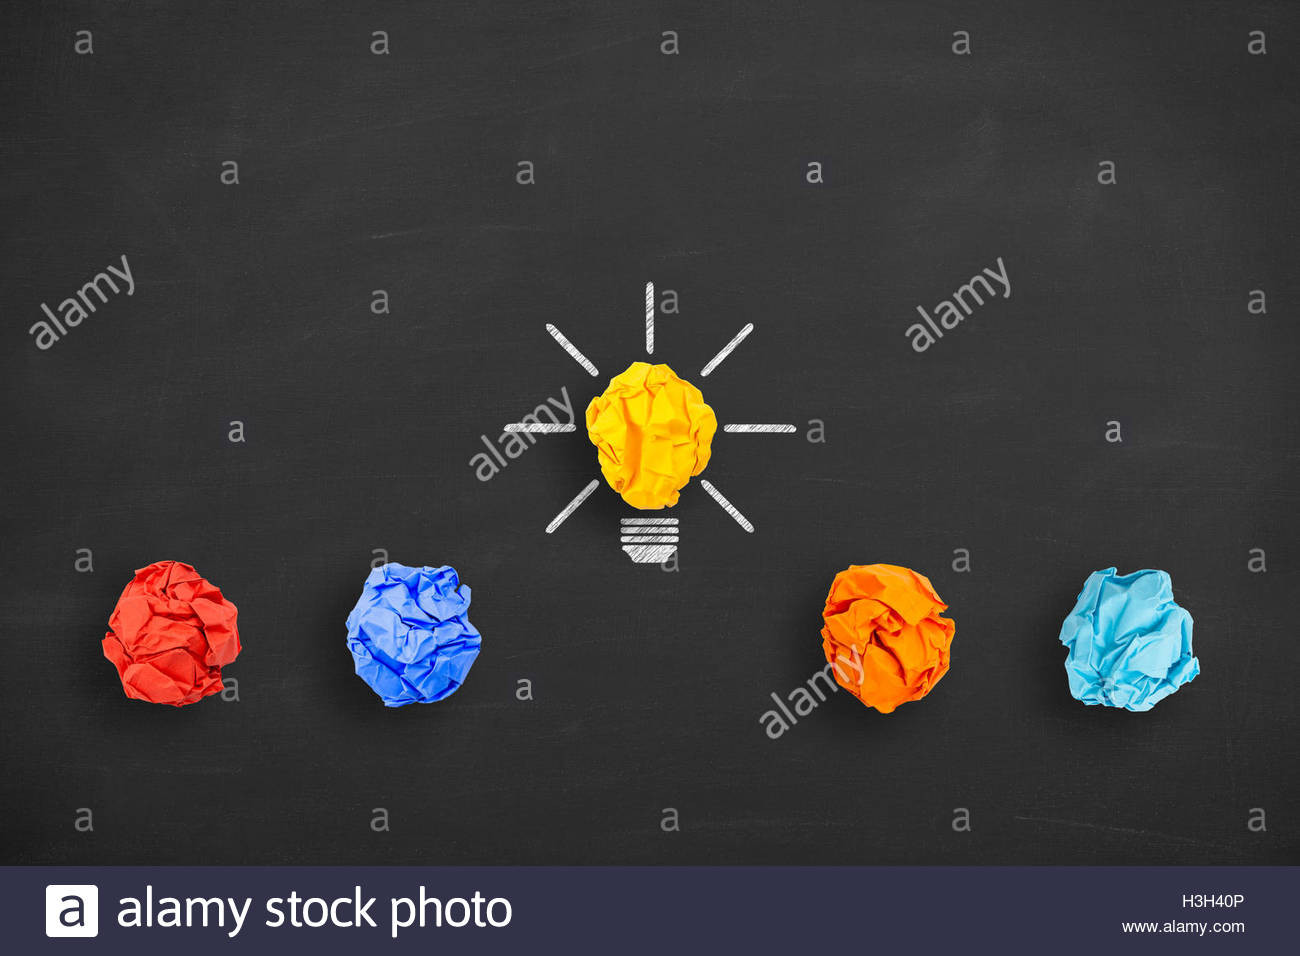 Idee Konzept zerknittertes Papier Glühbirne Metapher für gute Idee an Tafel Stockbild